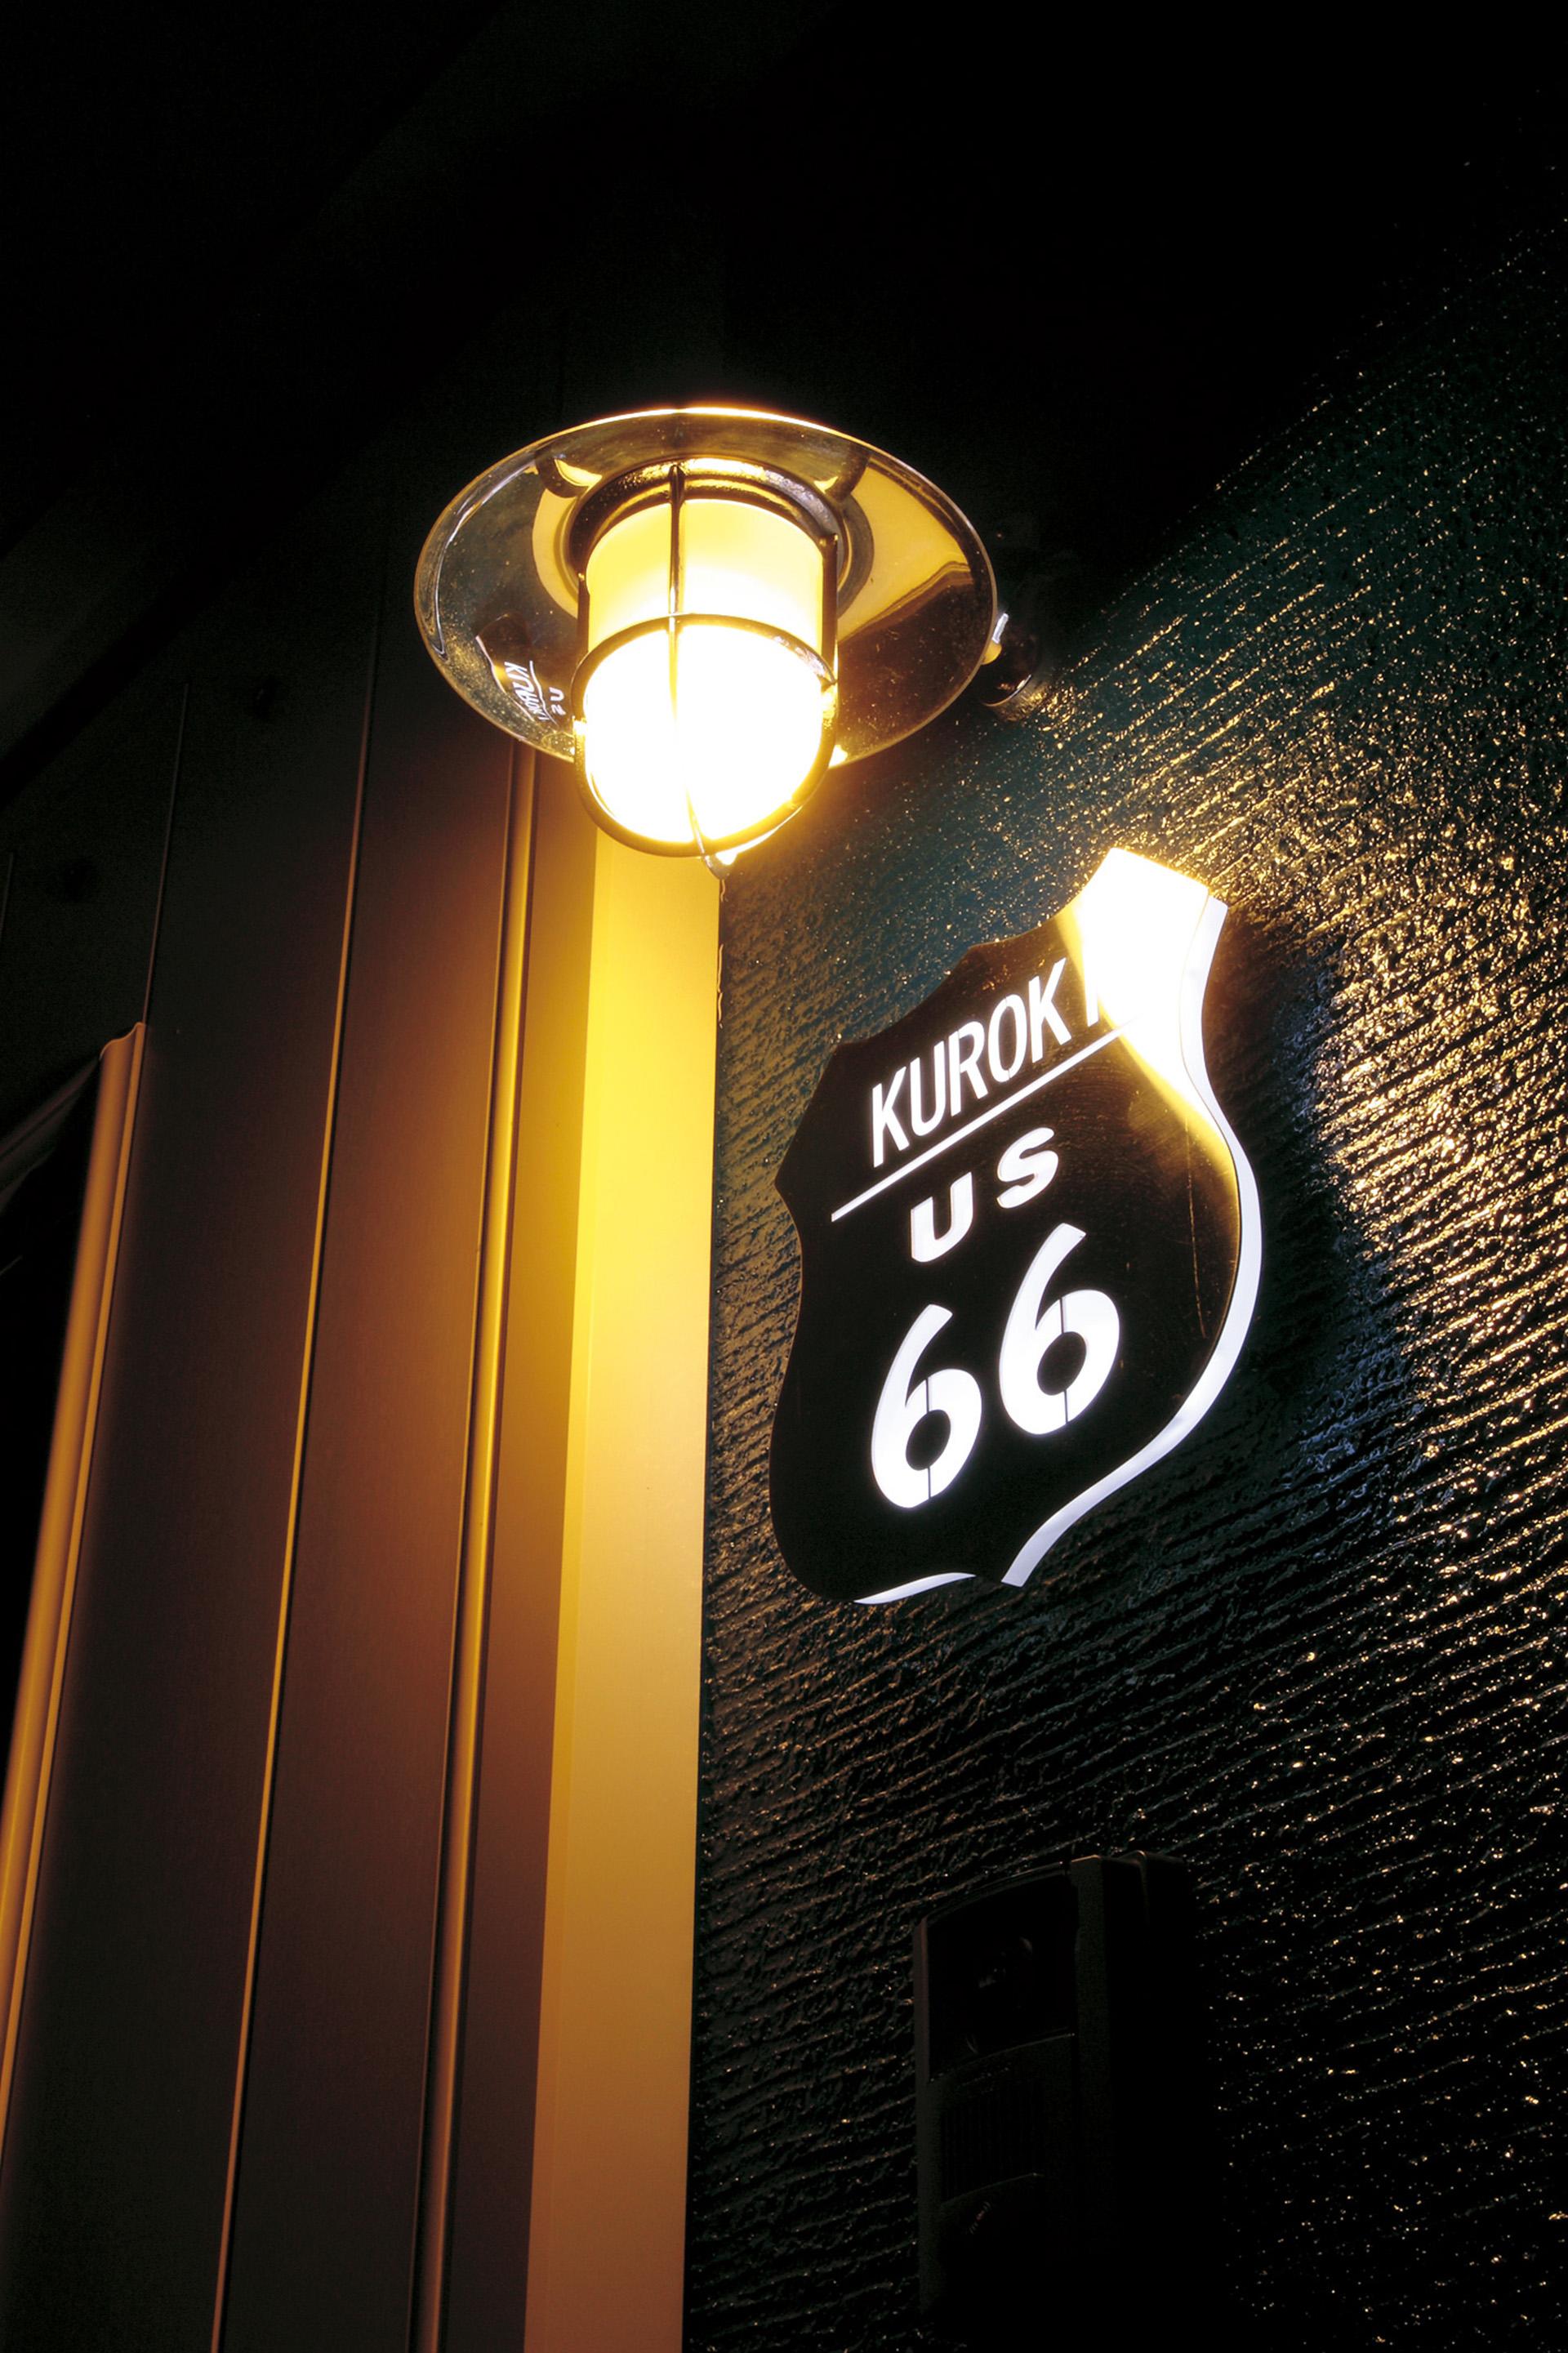 KUROKI US 66